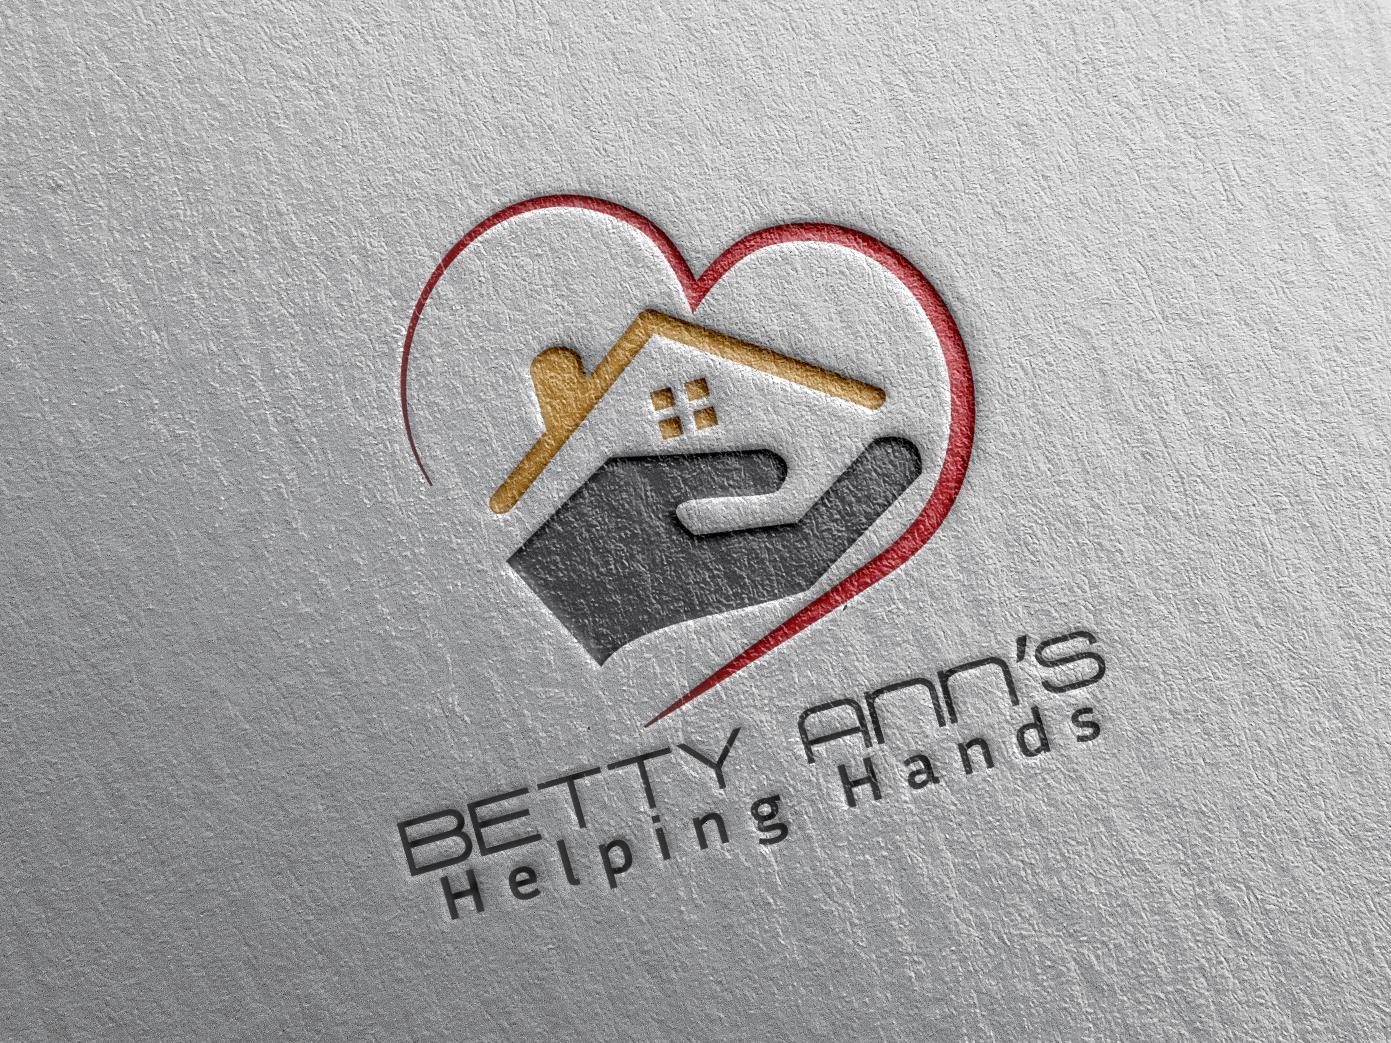 BETTY ANN'S HELPING HAND LOGO. Helping hands logo, Hand